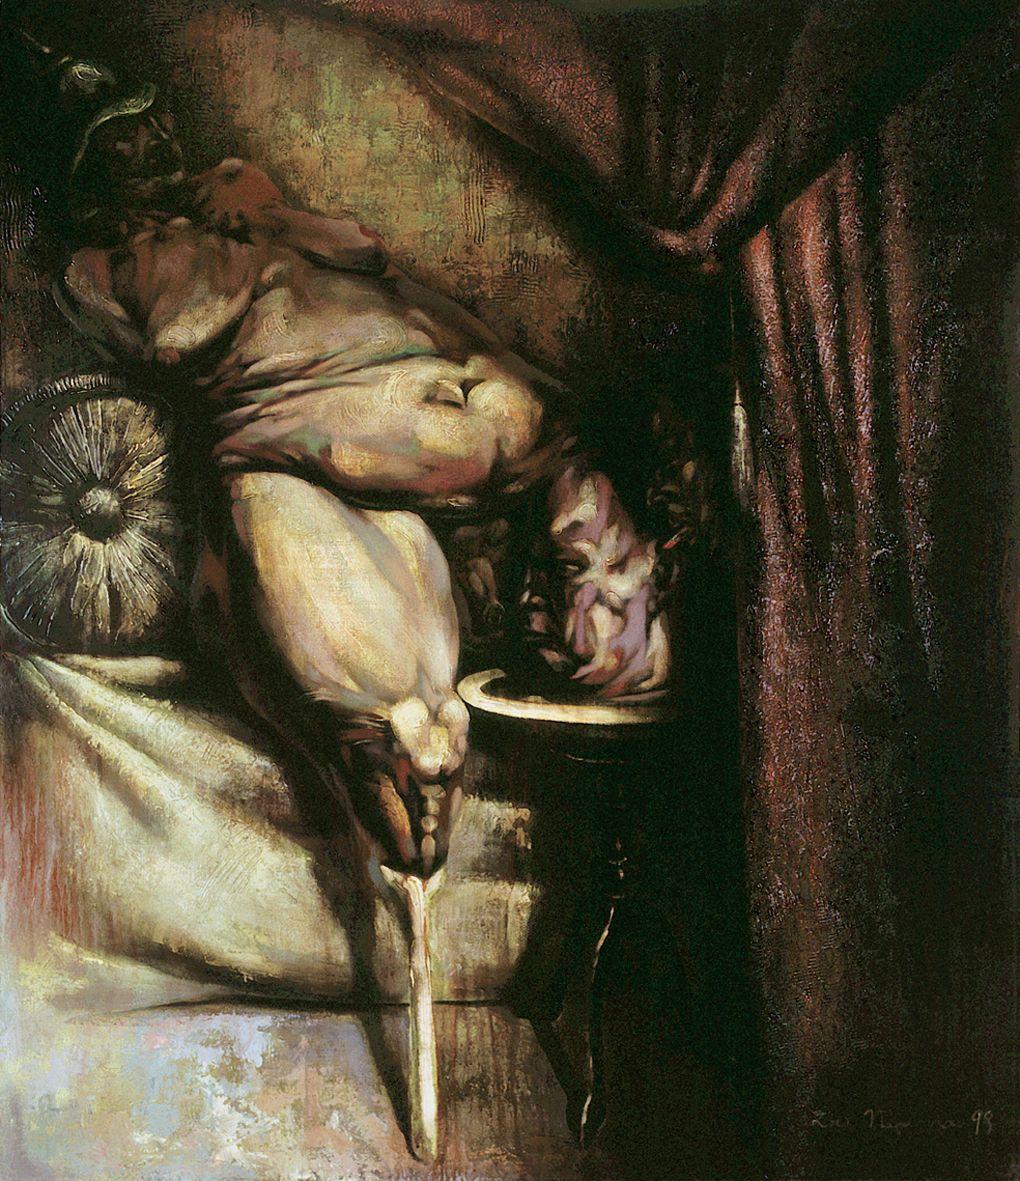 Ігор Подольчак. Поцілунок Соломеї, 1998